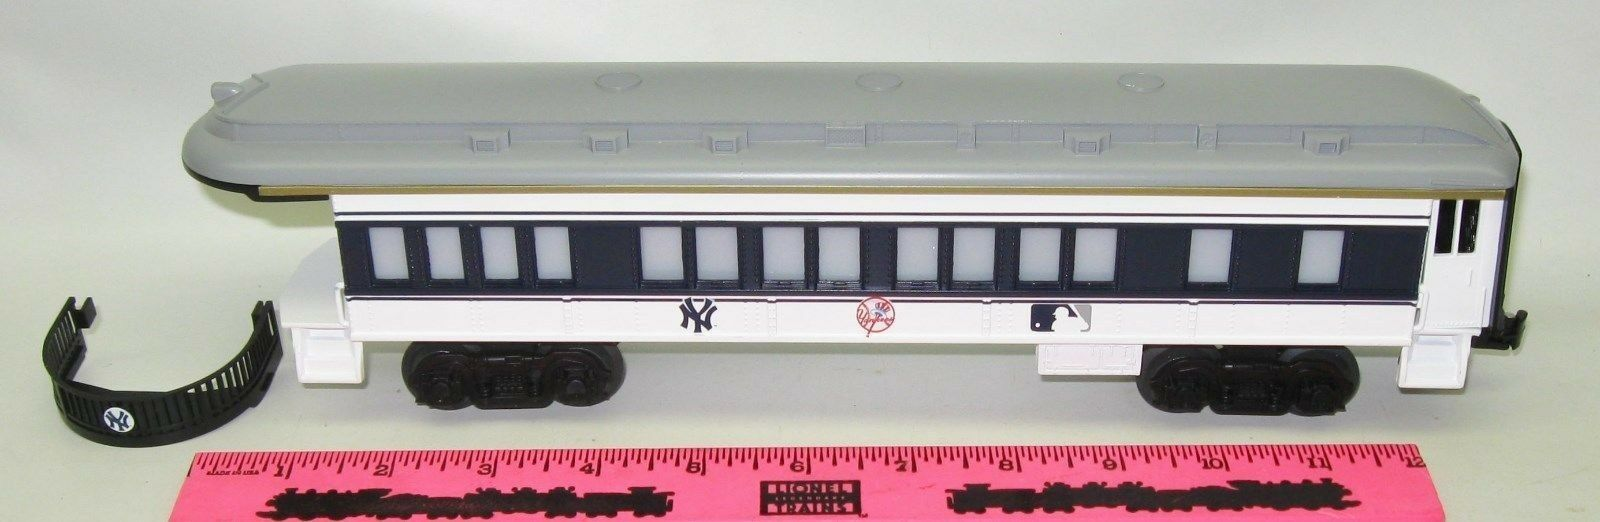 New Lionel New York Yankees Observation Car Major League Baseball